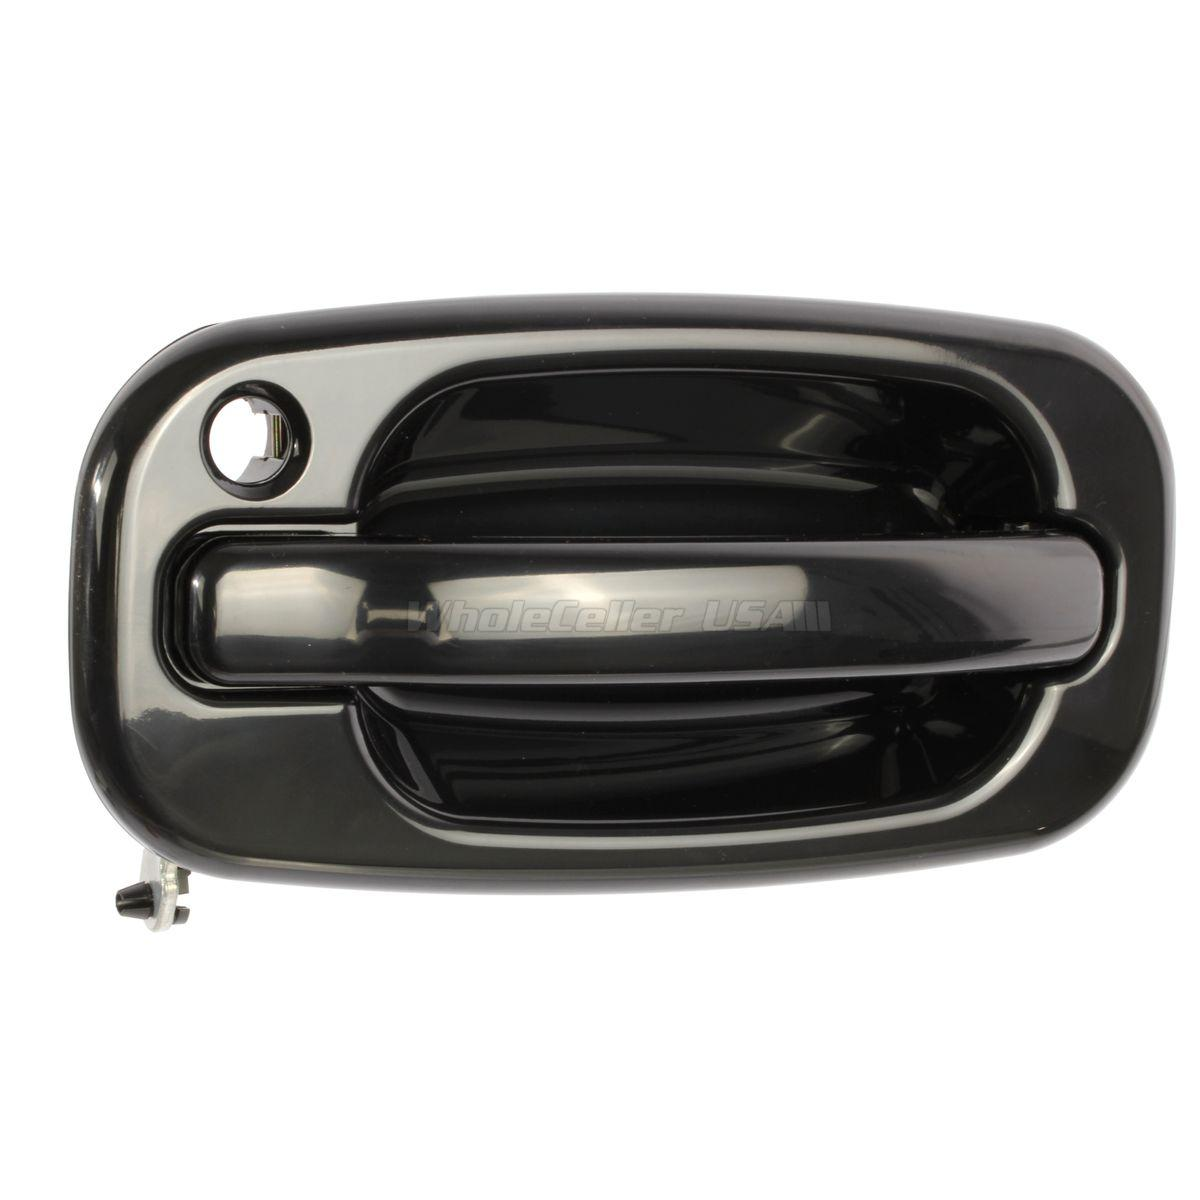 2012 Chevrolet Suburban 1500 Transmission: Outer Black Front Left LH Door Handle For 03-06 Chevrolet